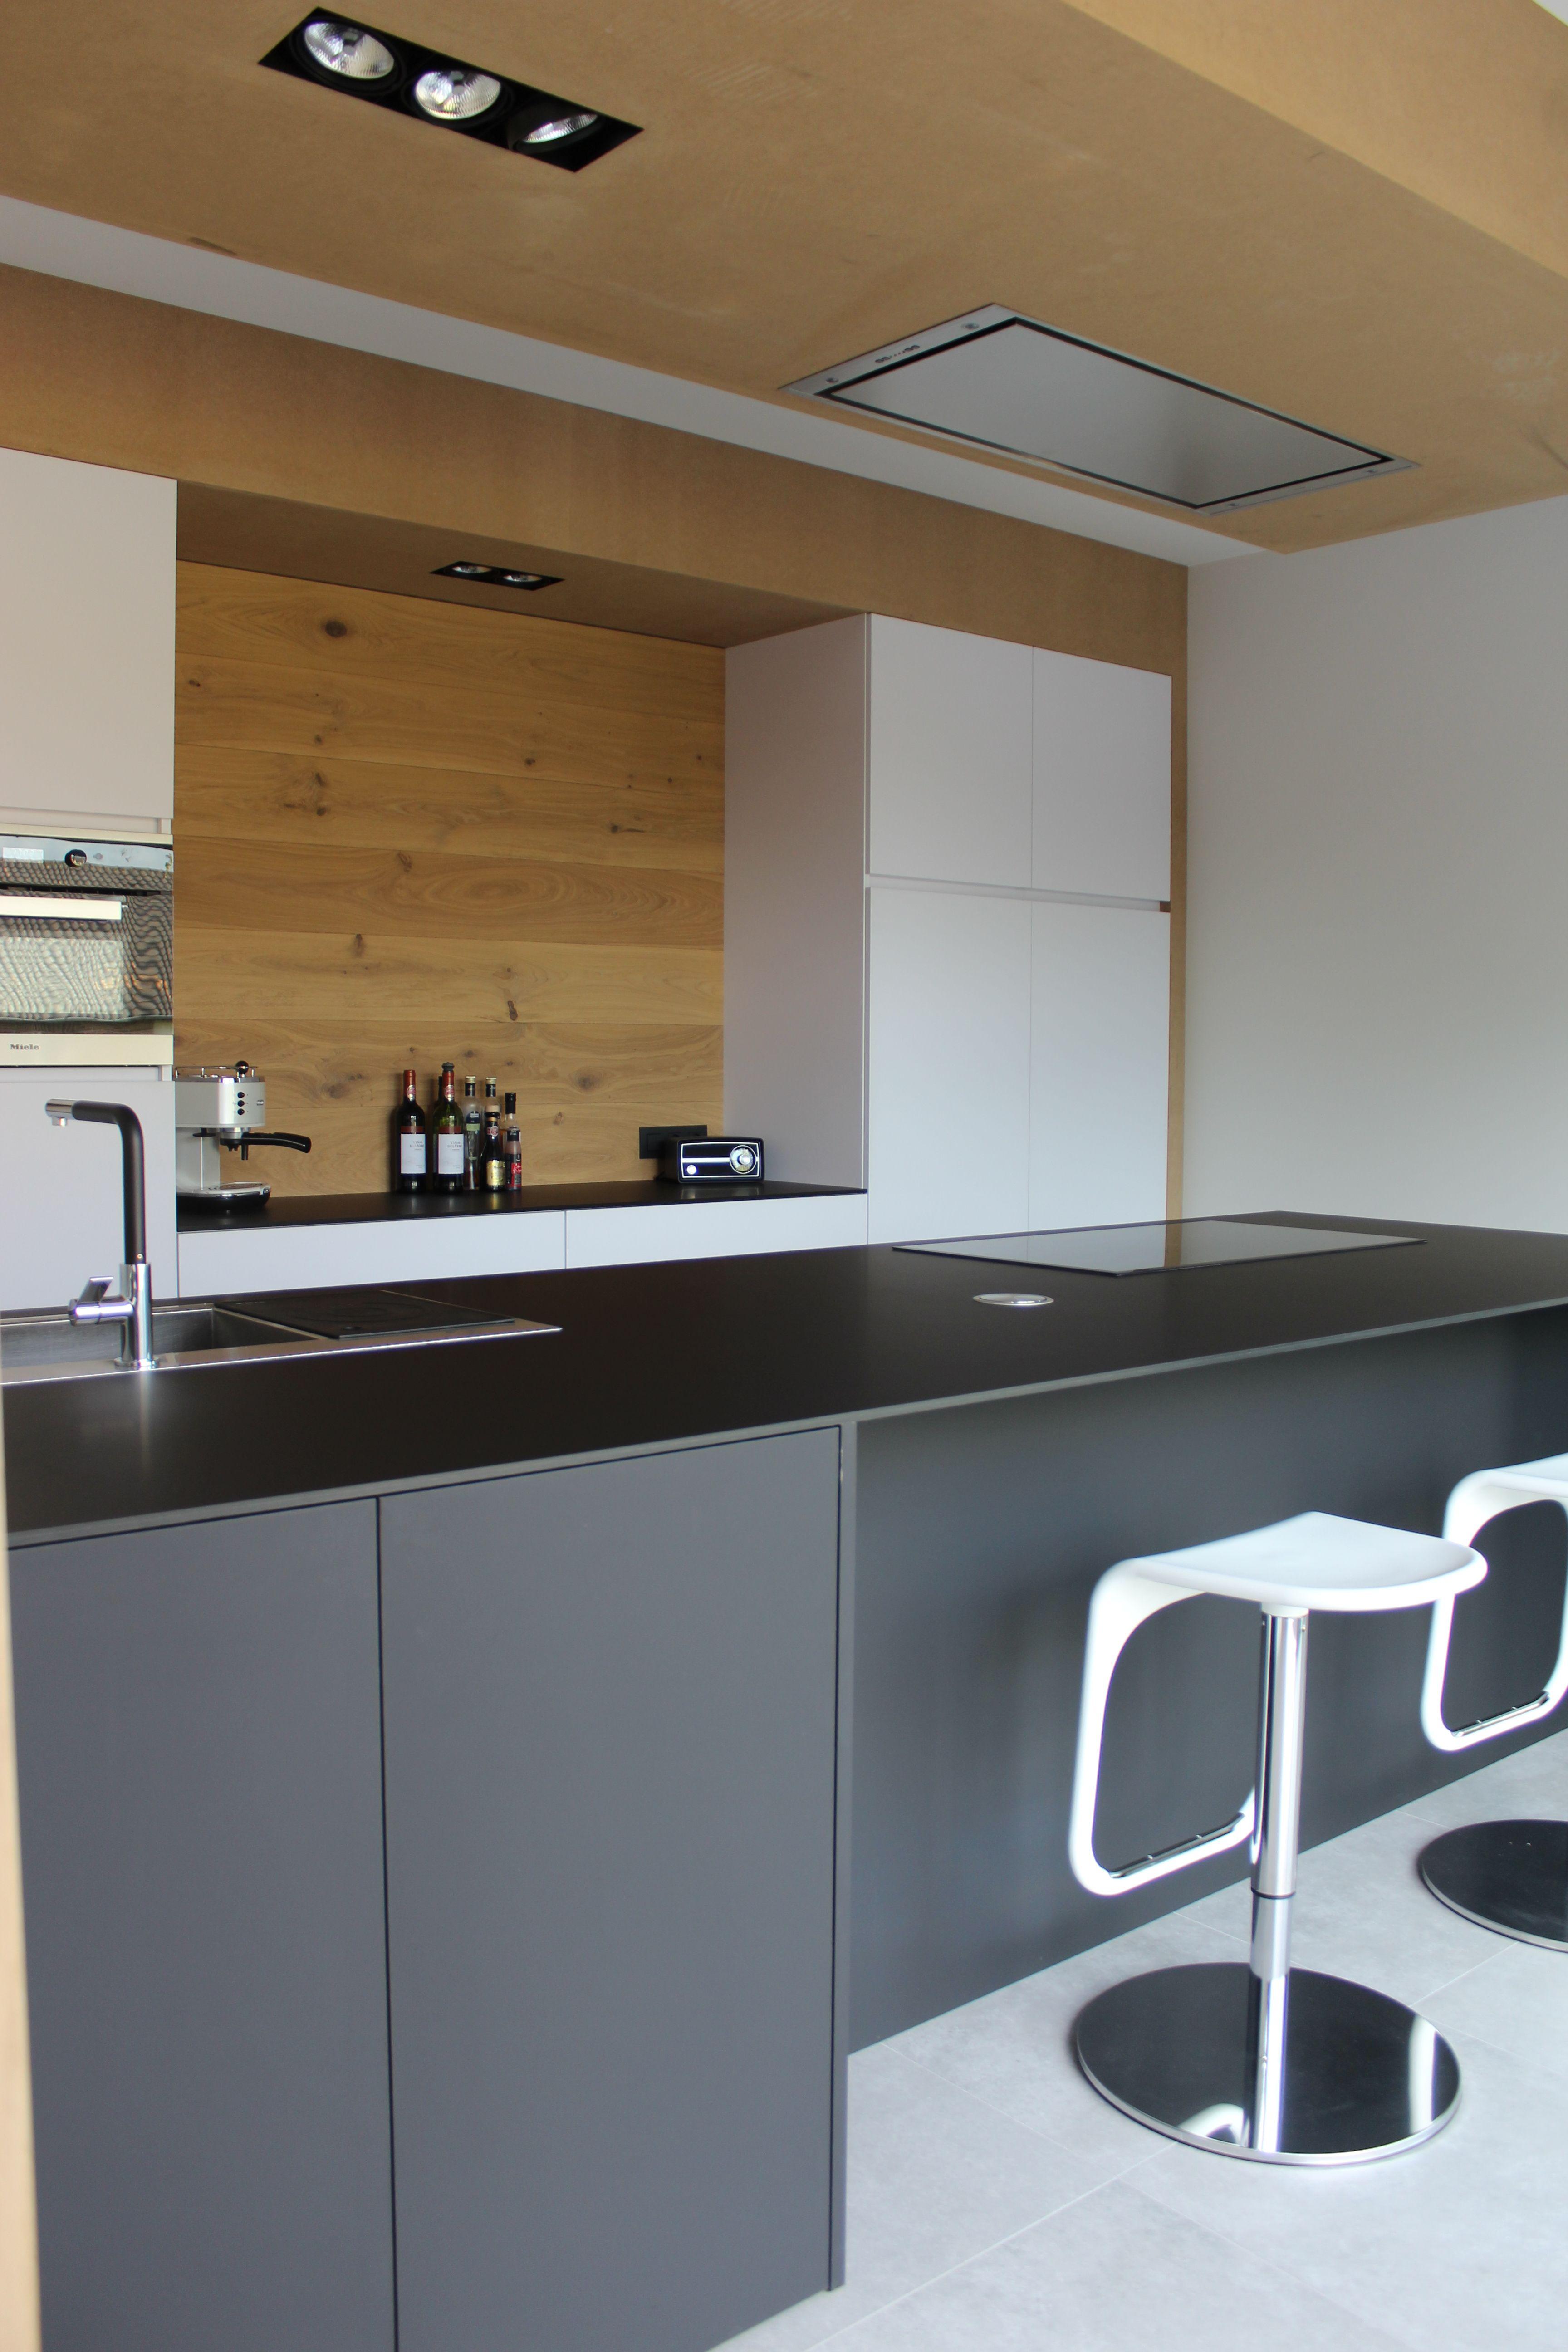 Moderne strakke keuken wit en zwart gecombineerd met hout kookeiland in materiaal fenix ntm for Deco moderne keuken